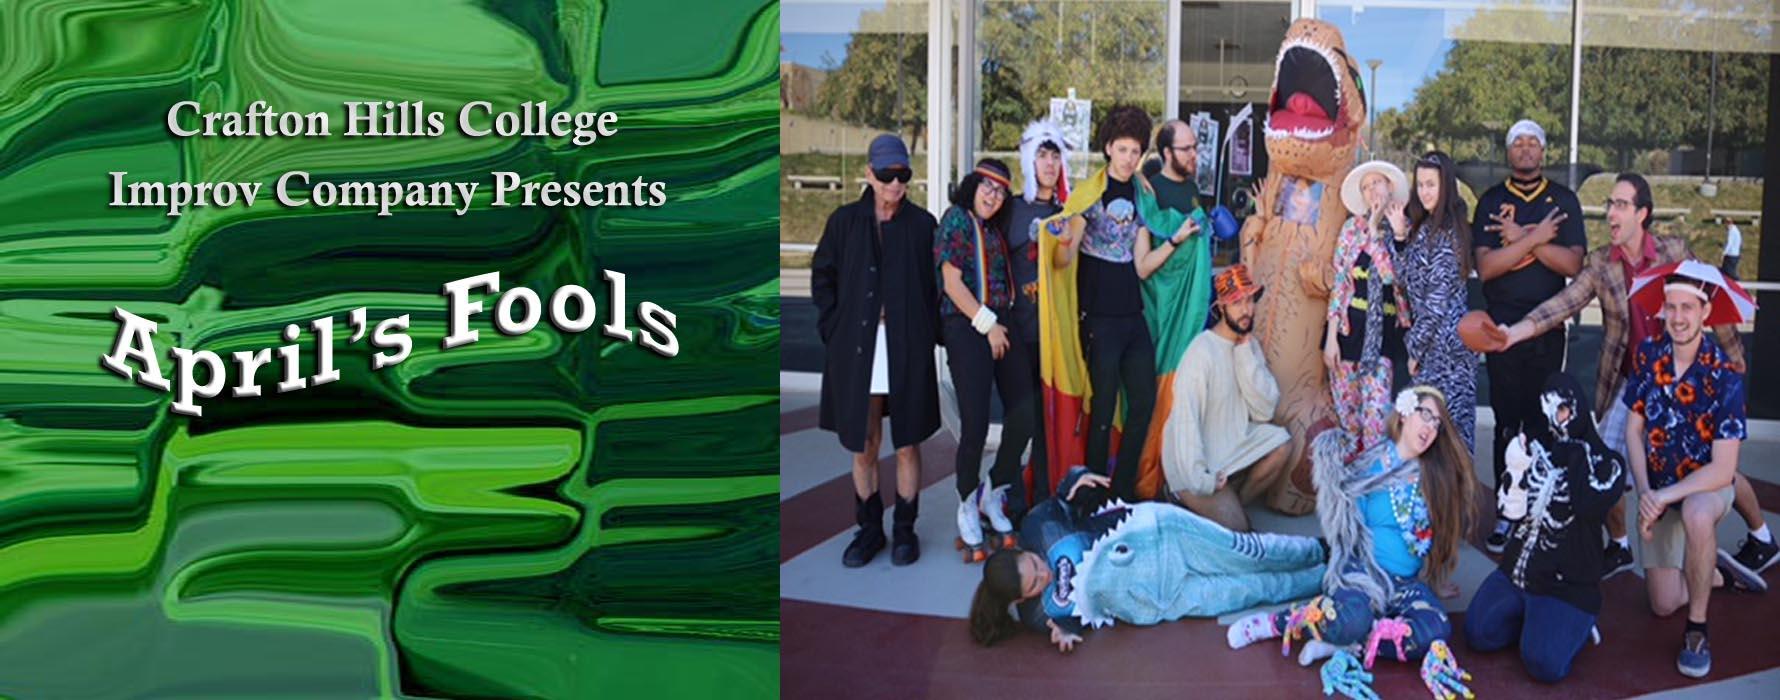 Crafton Hills College Improv Company Presents